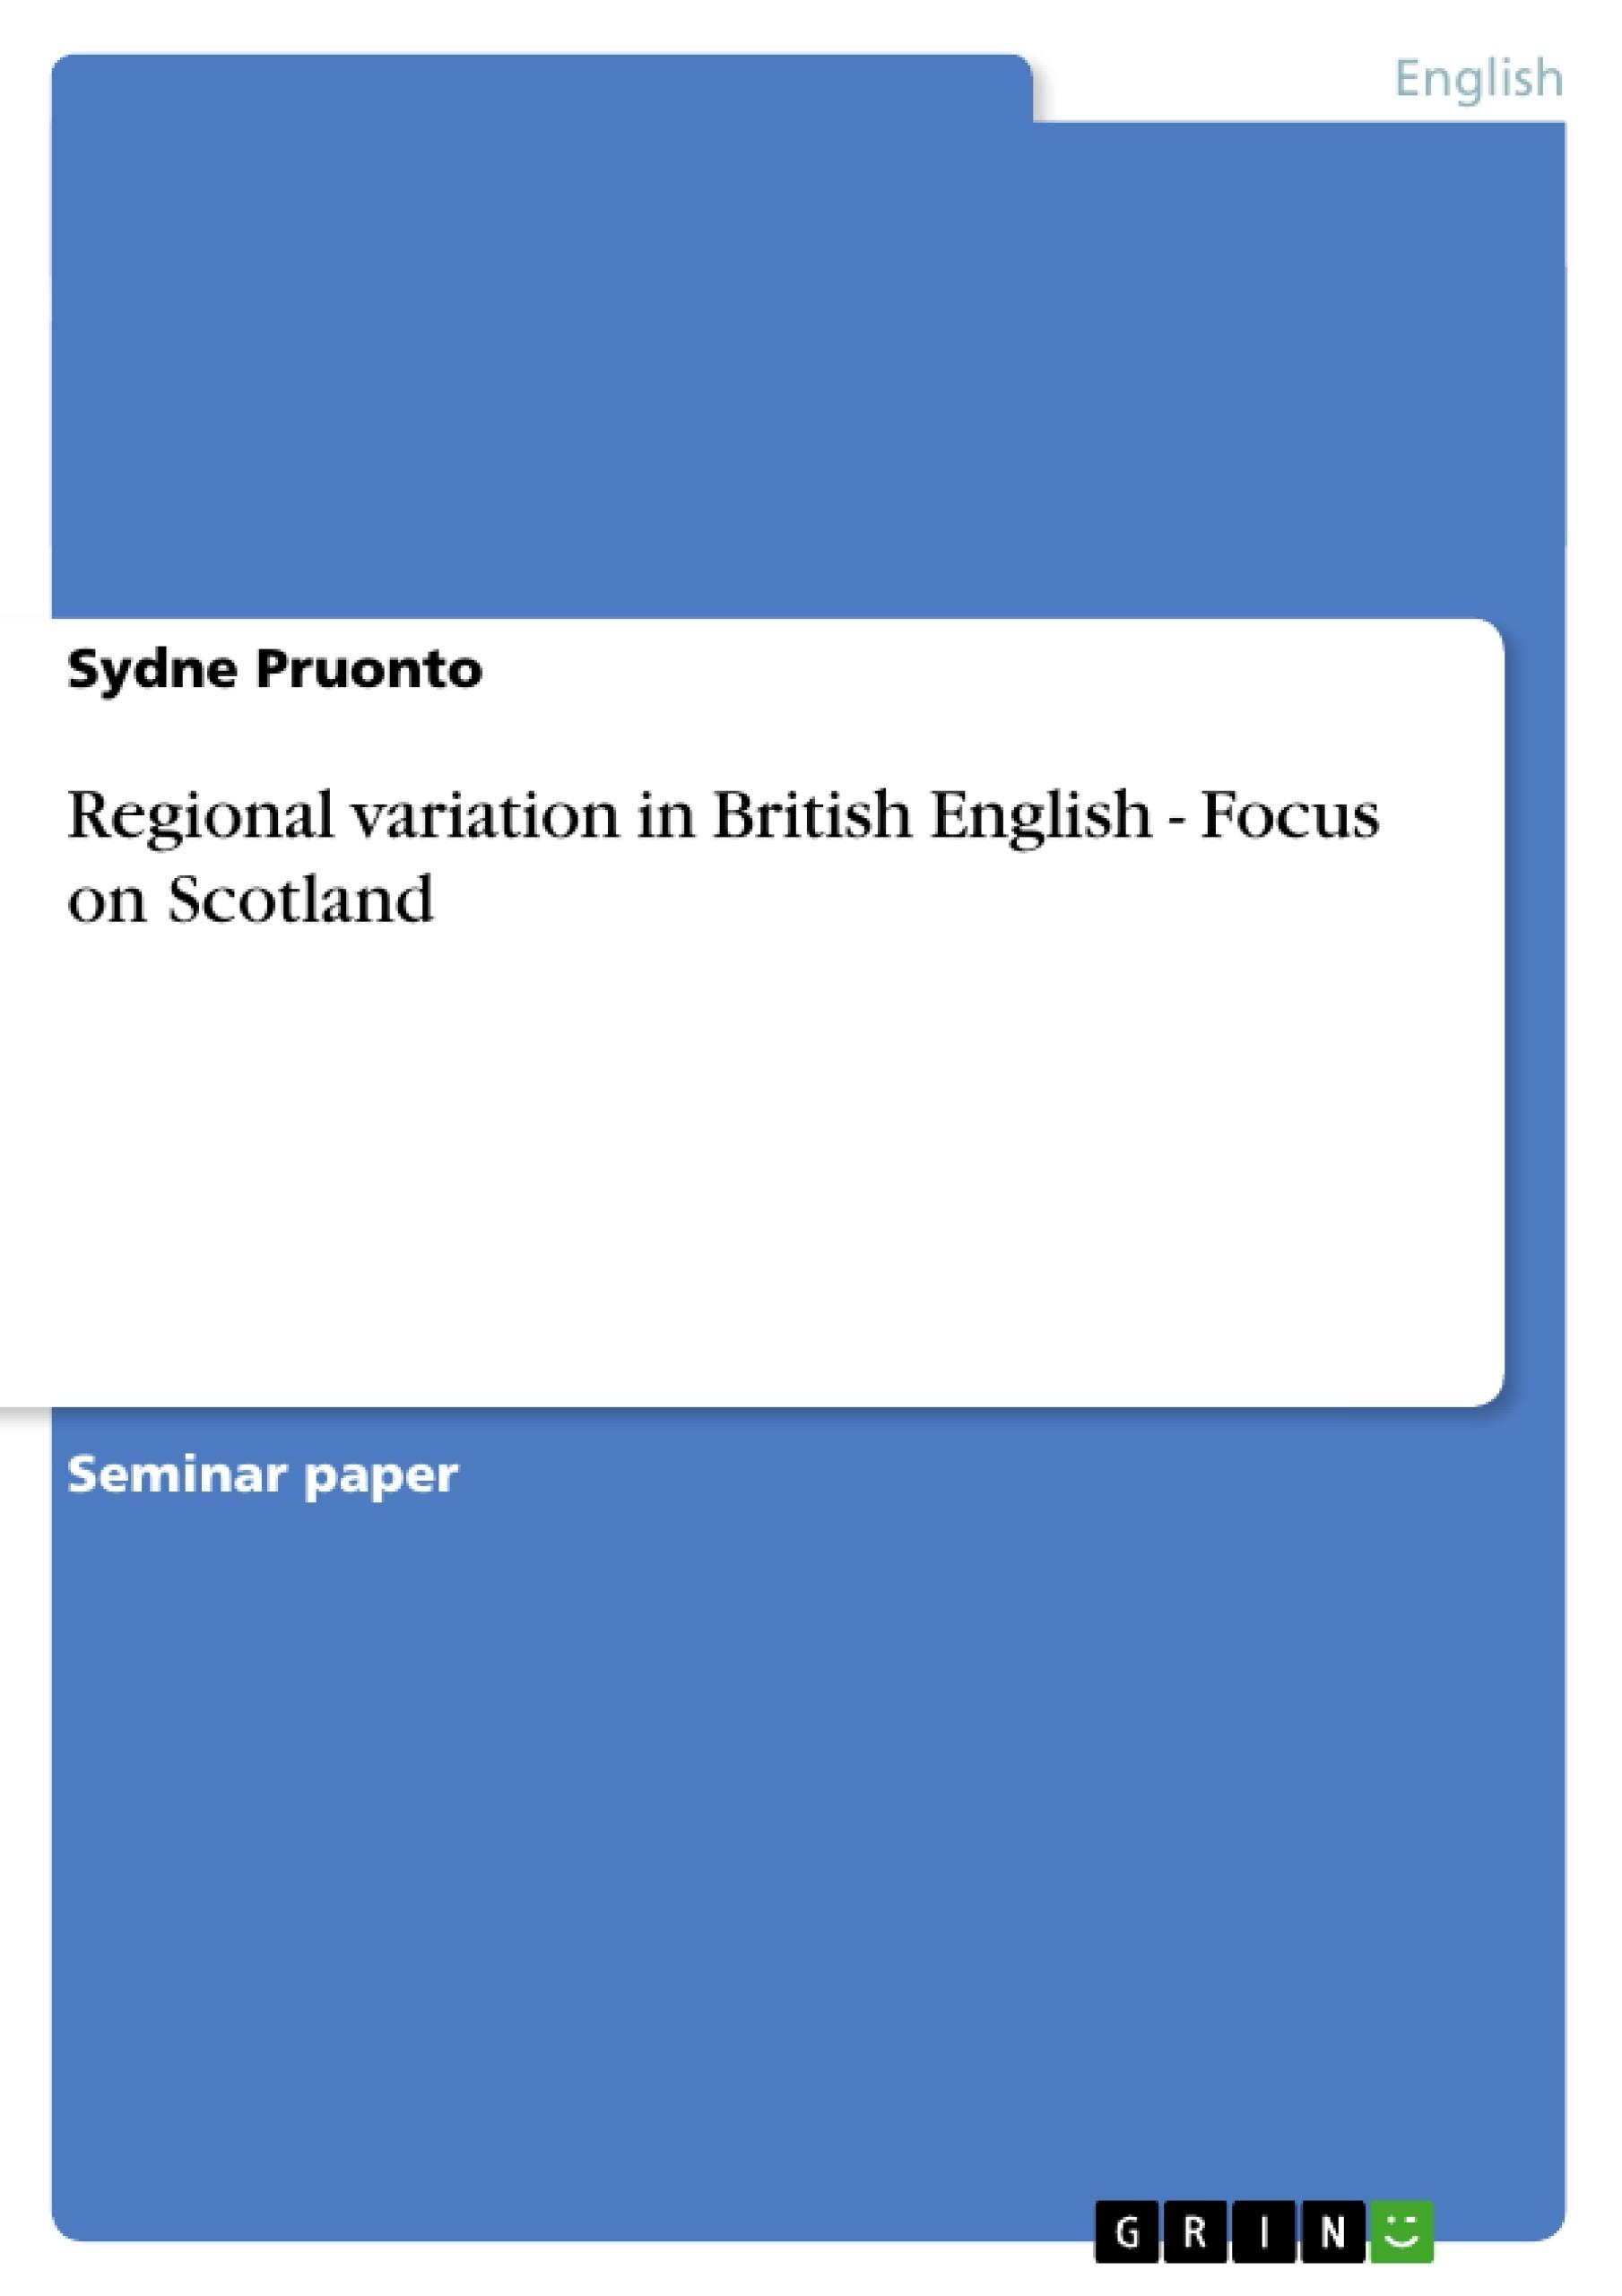 Title: Regional variation in British English - Focus on Scotland